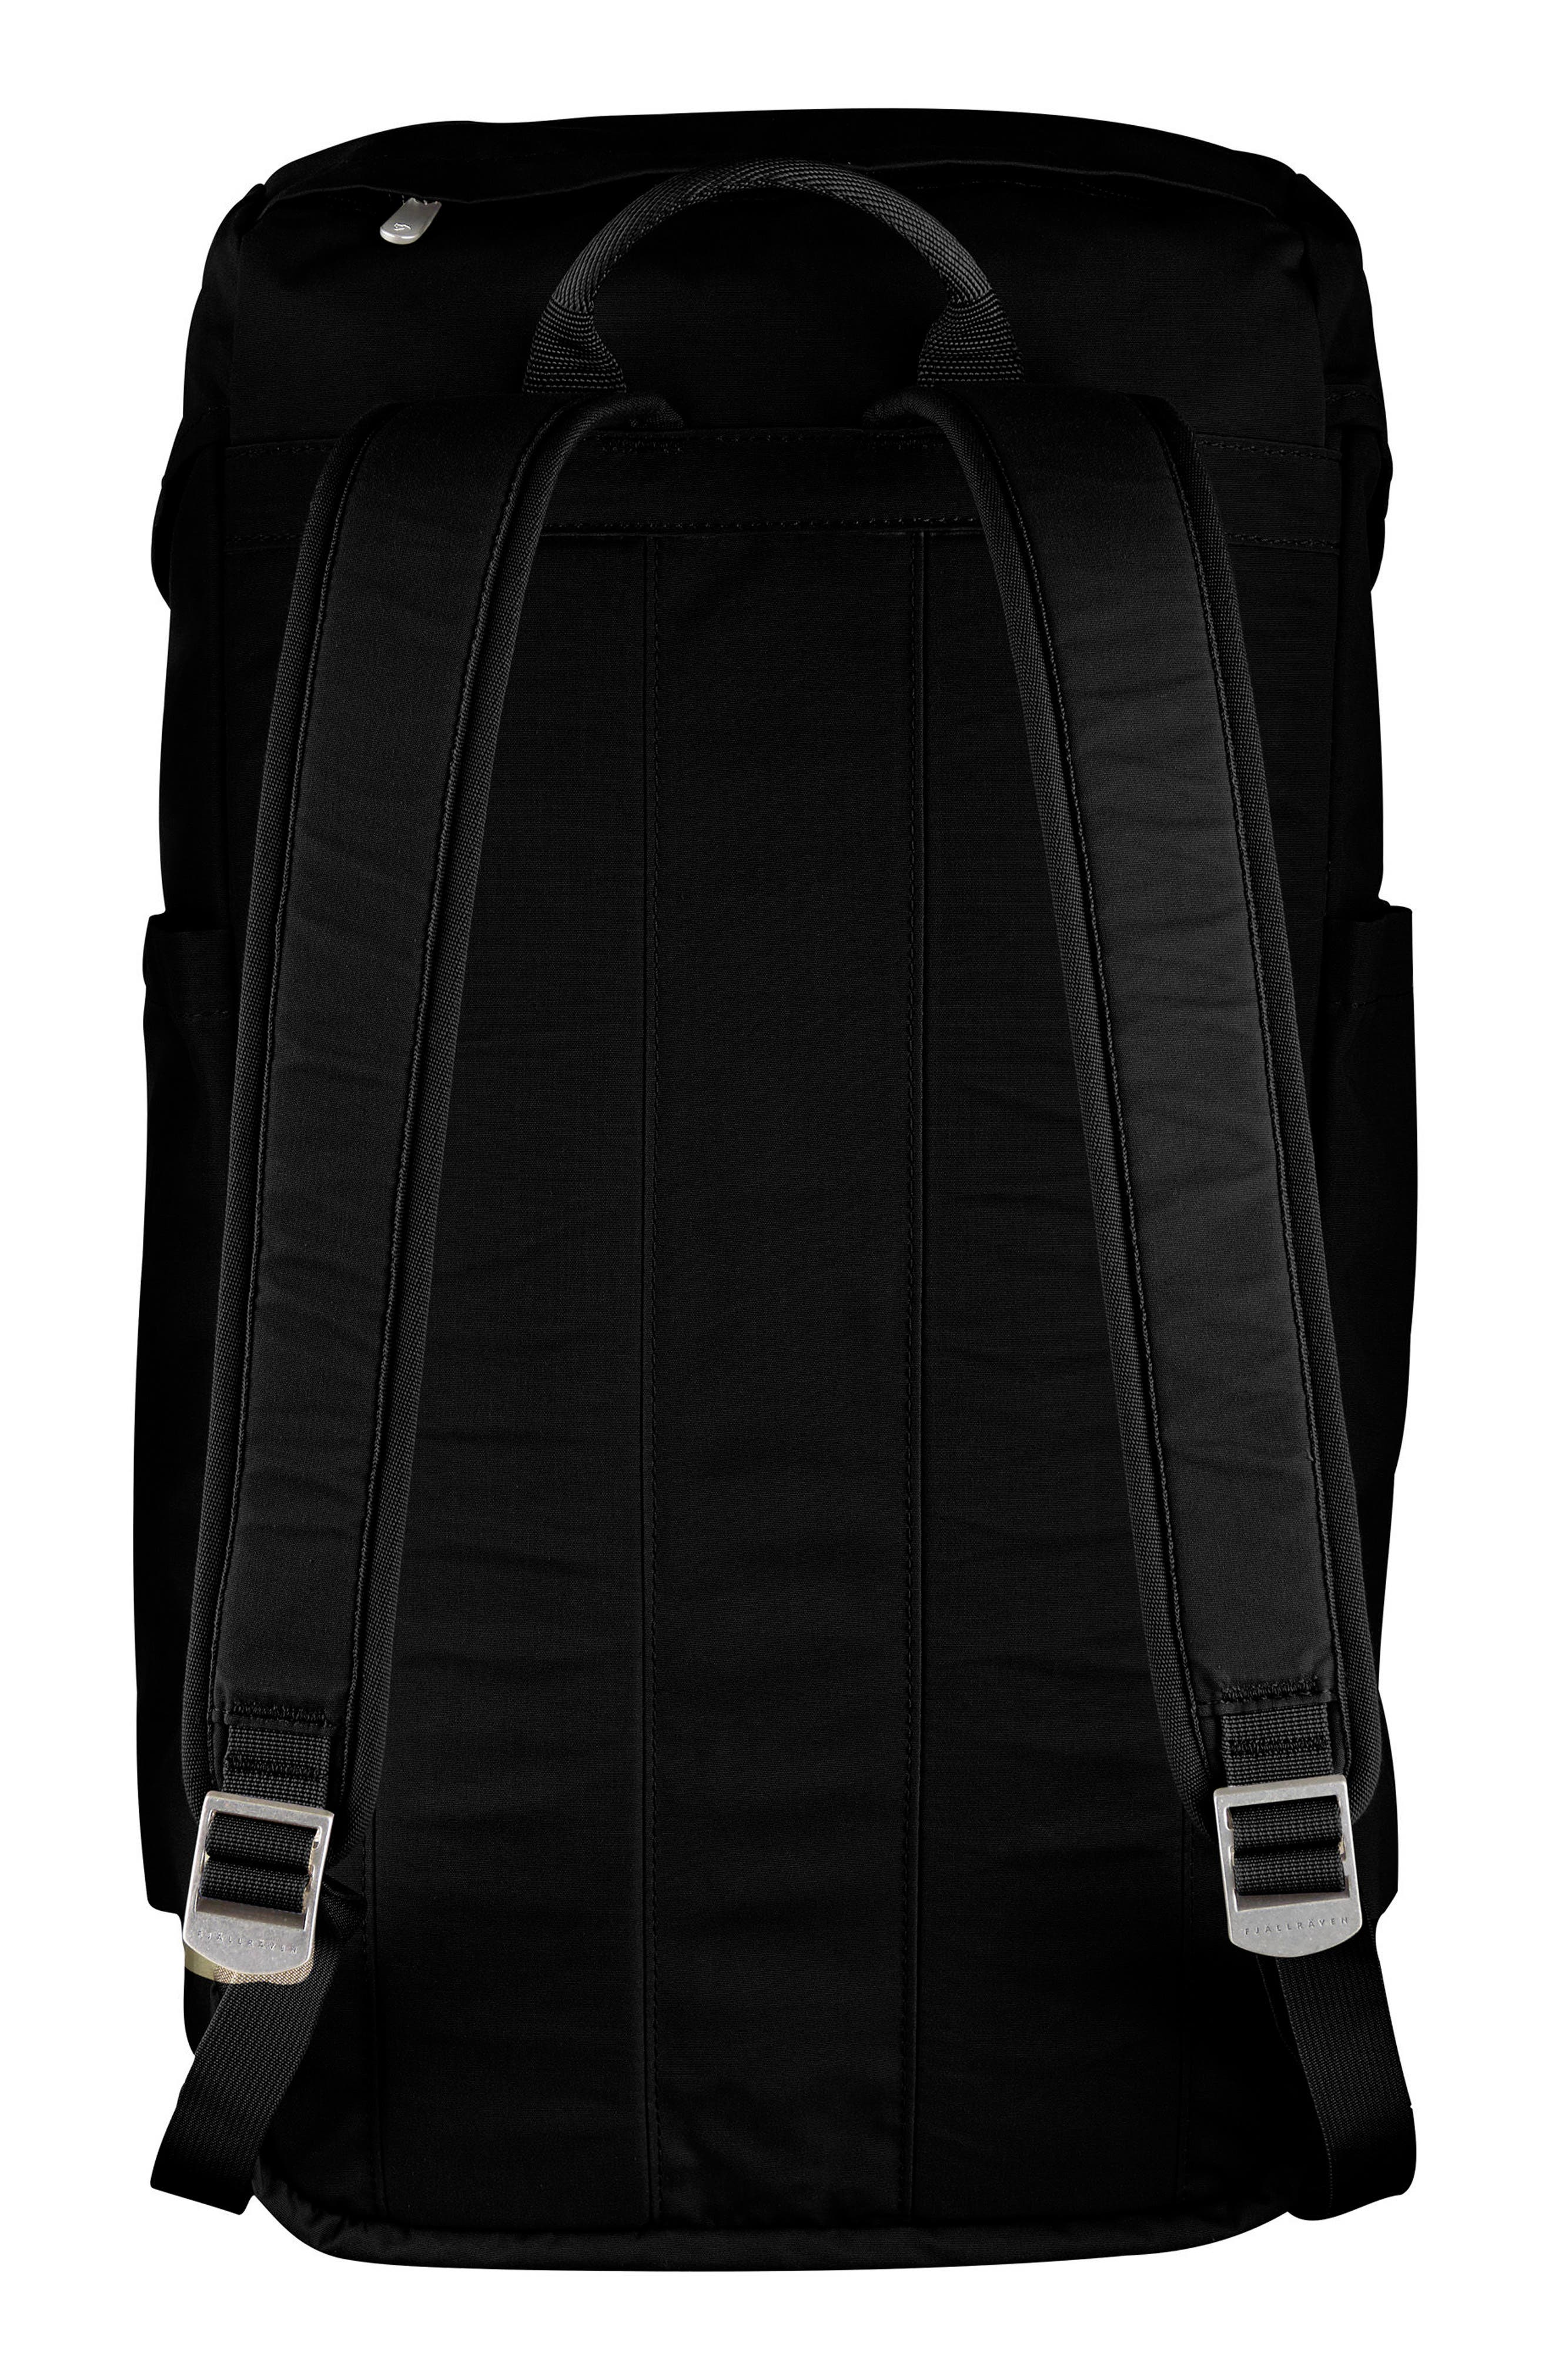 Greenland Large Backpack,                             Alternate thumbnail 2, color,                             001